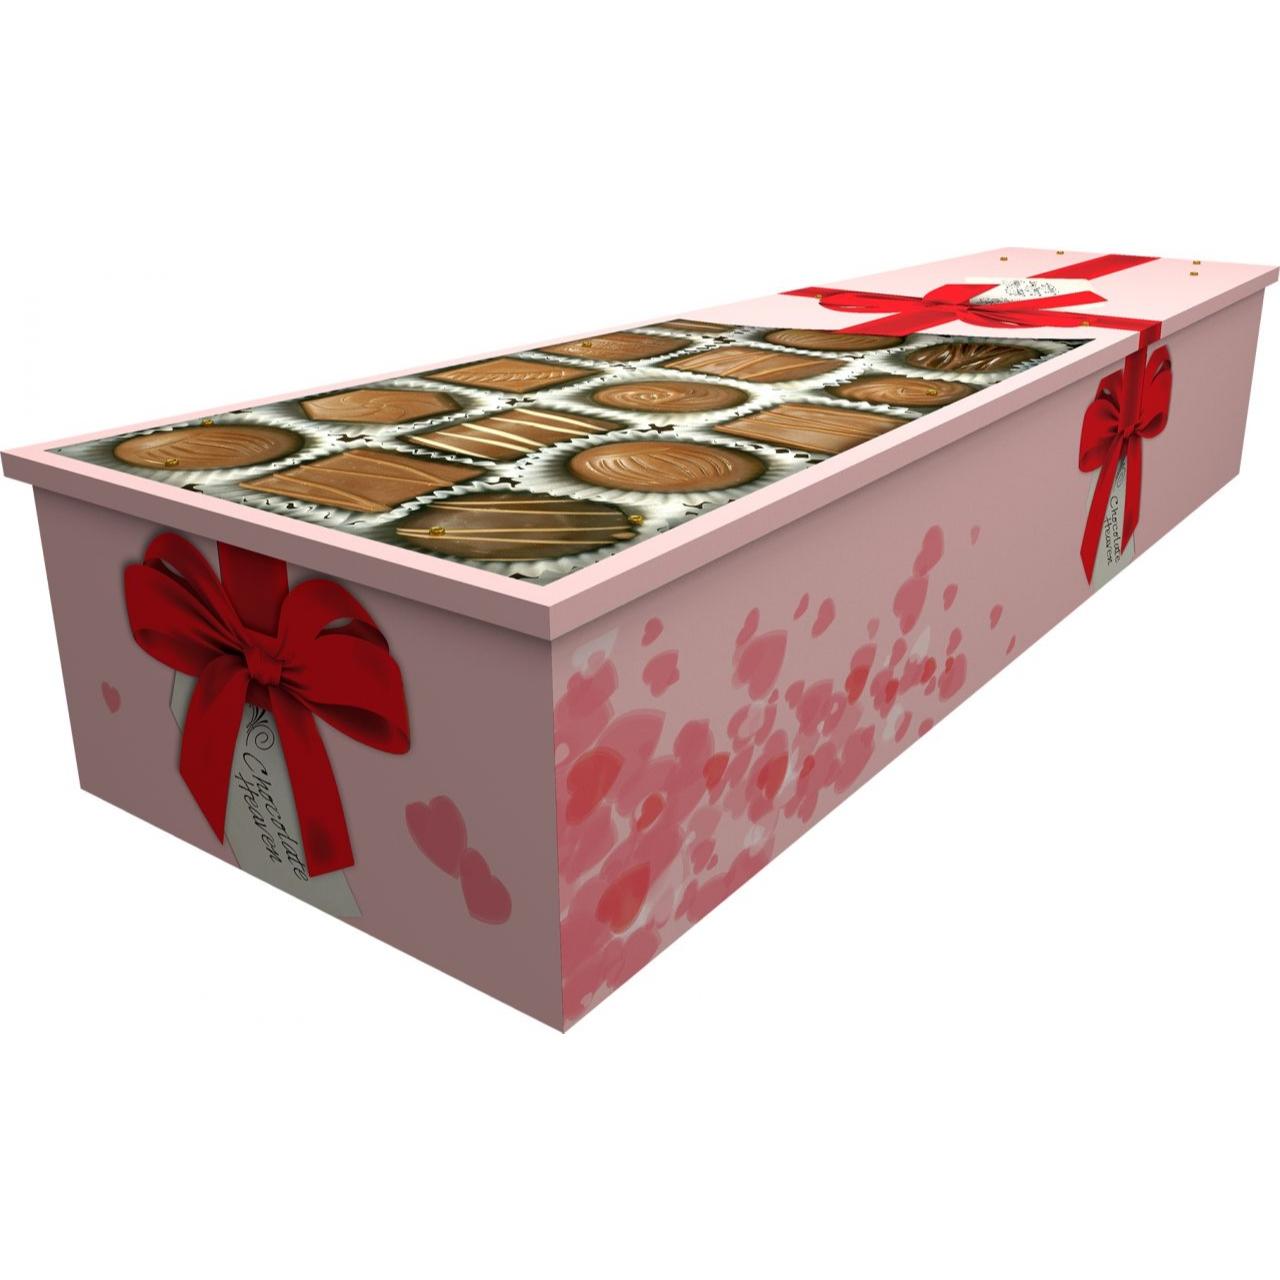 Chocolate Box Cardboard Coffin